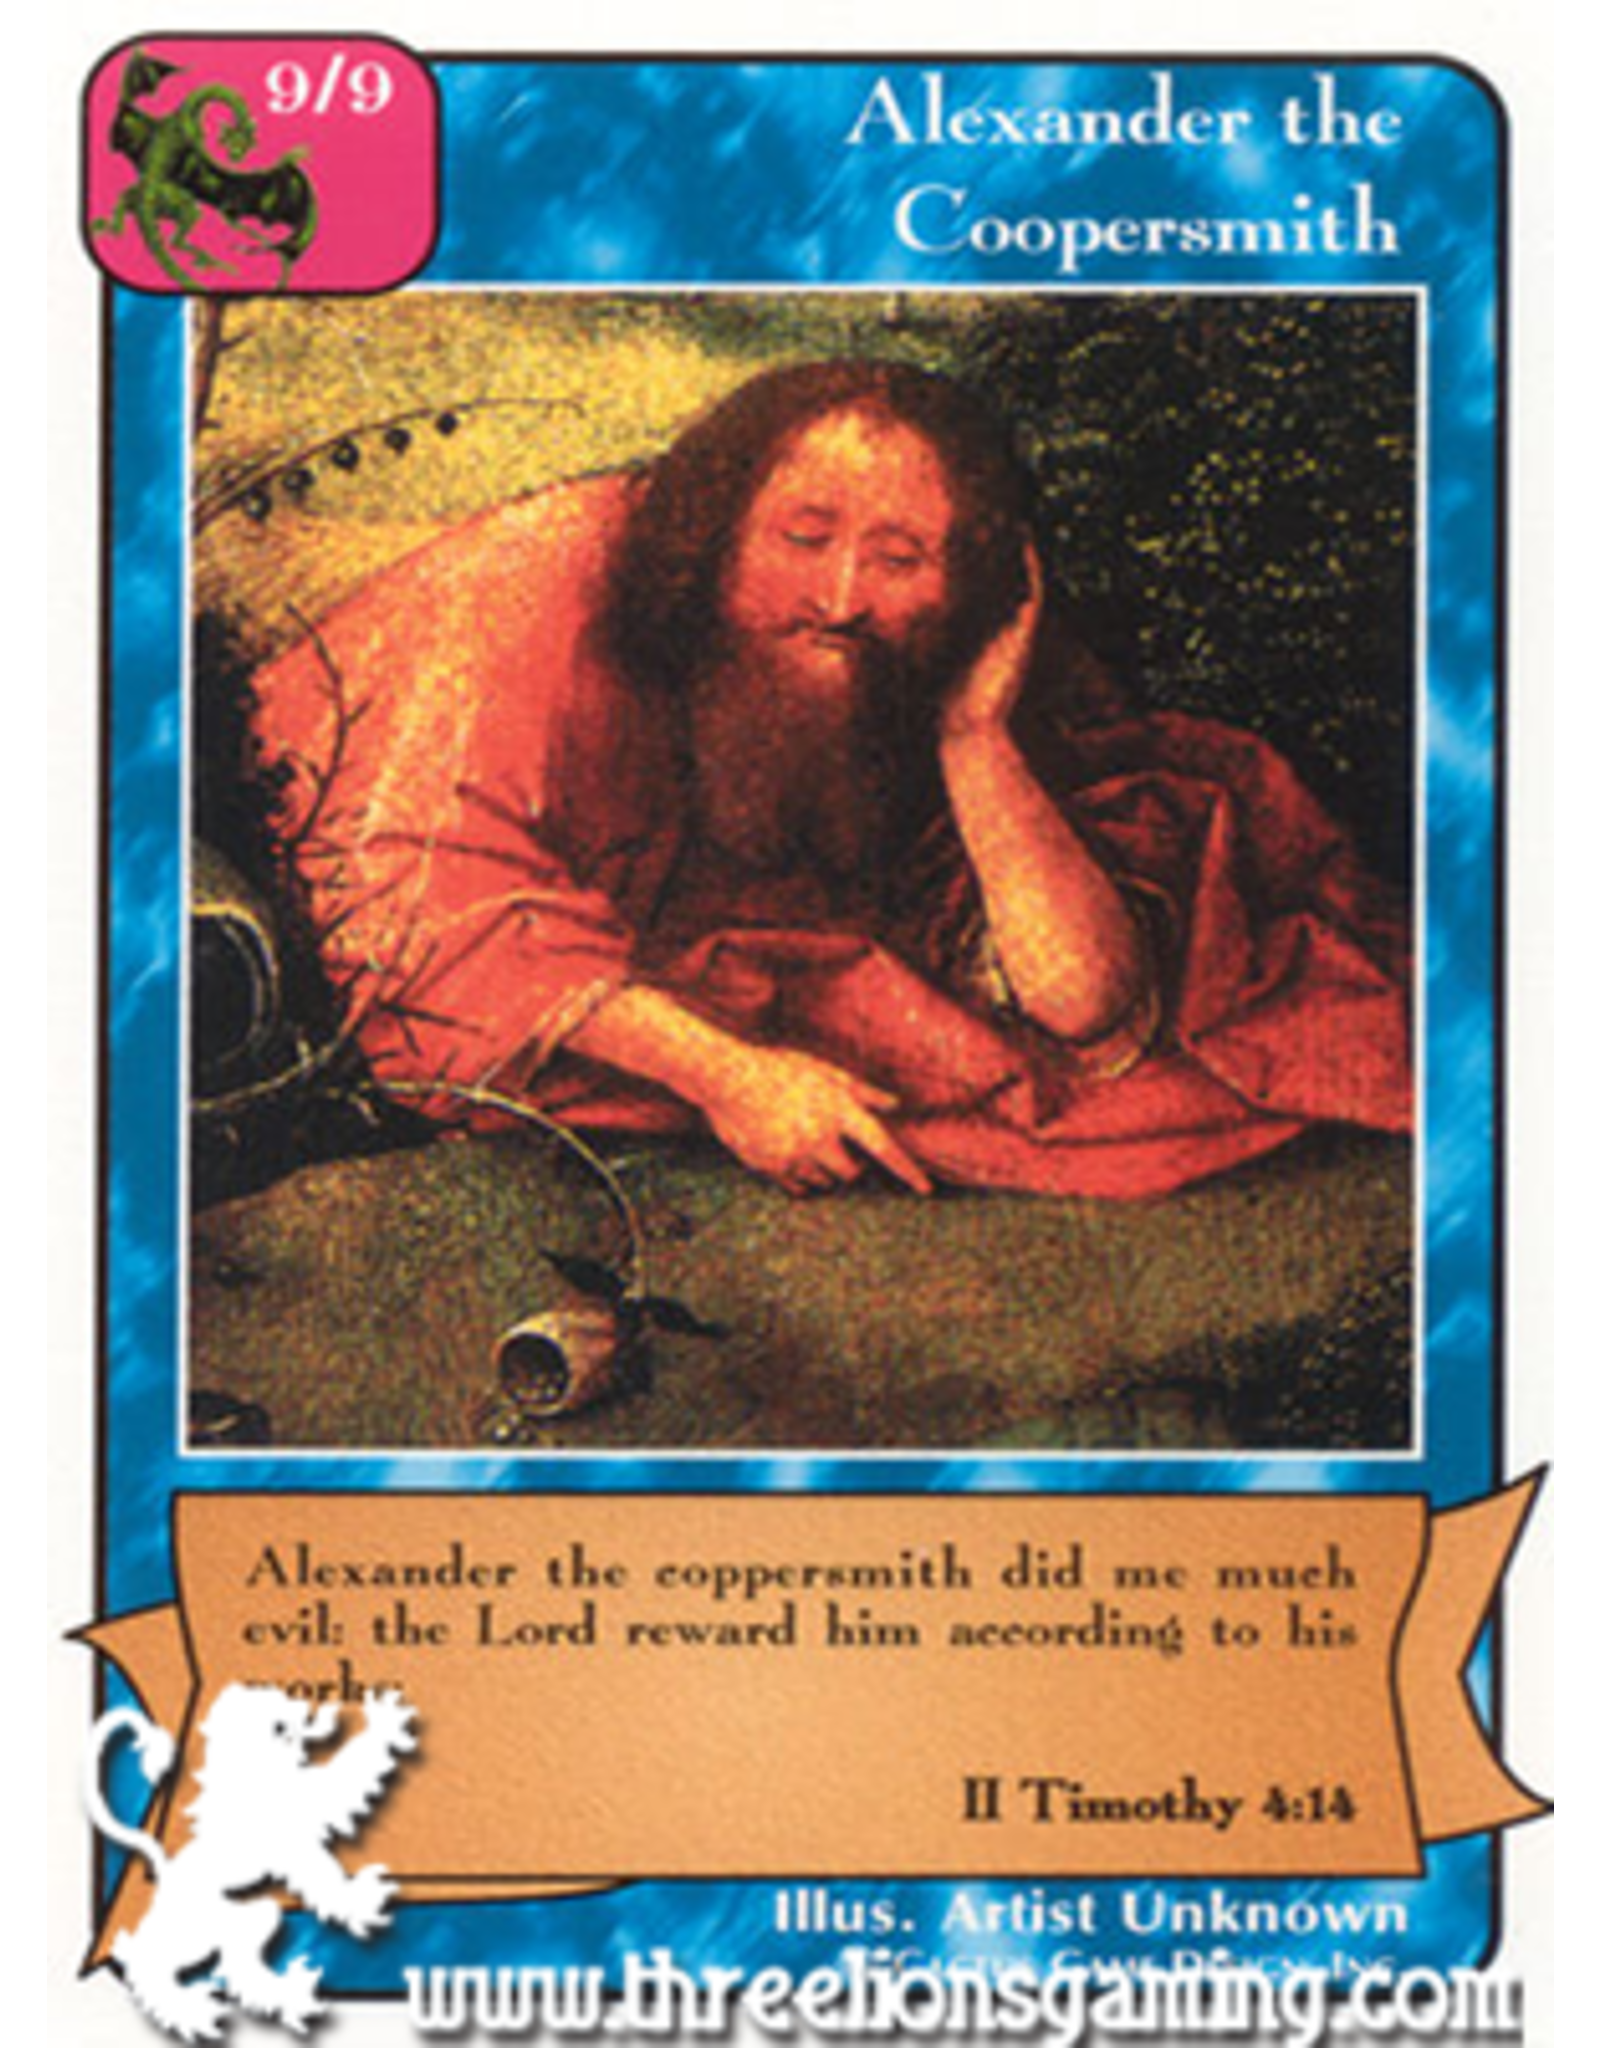 E/F: Alexander the Coppersmith